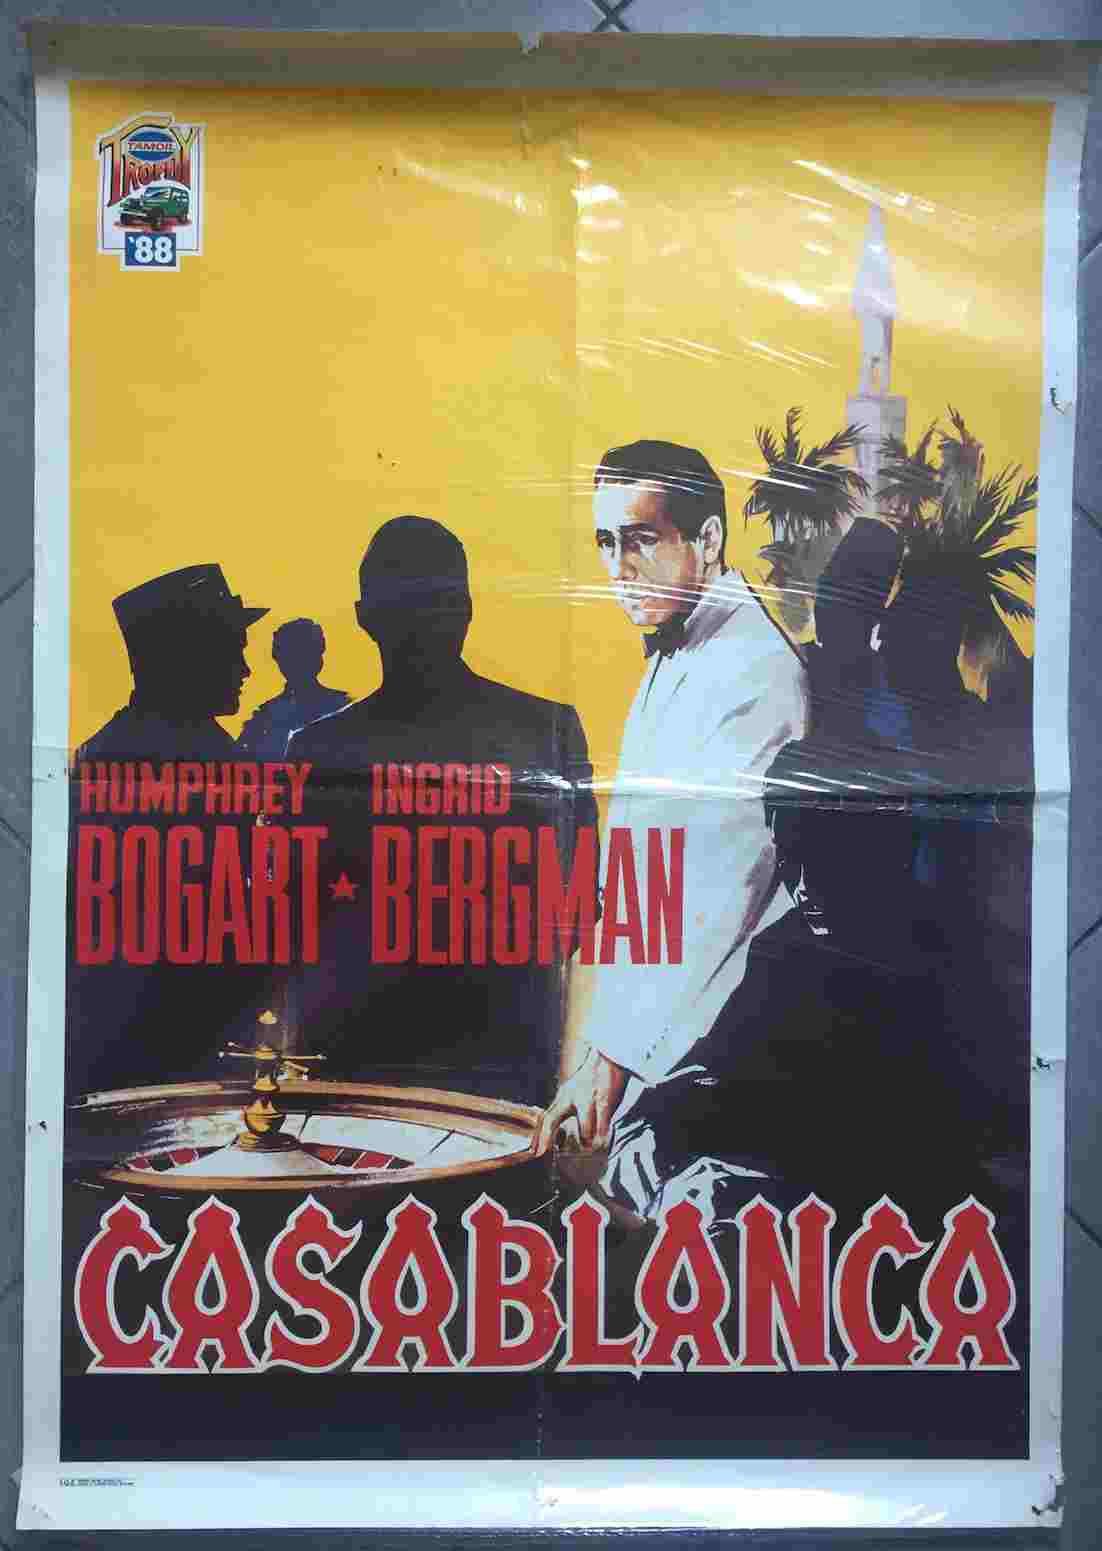 soggettone Casablanca